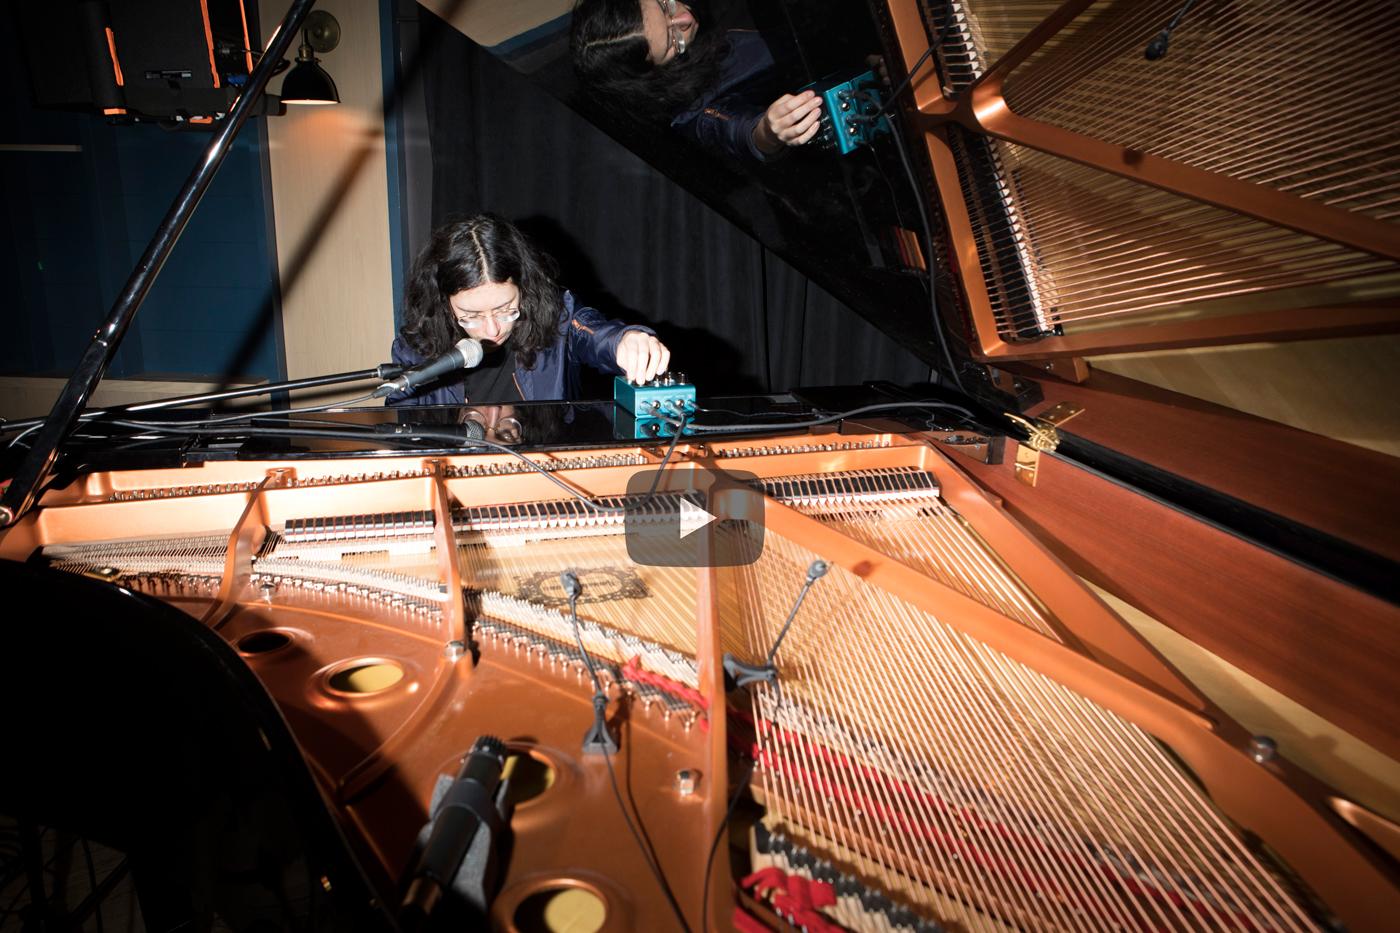 Live performanceAlexandra Stréliski performs Changing Winds/Plus tôt live at Burdock Music Hall.January 2019